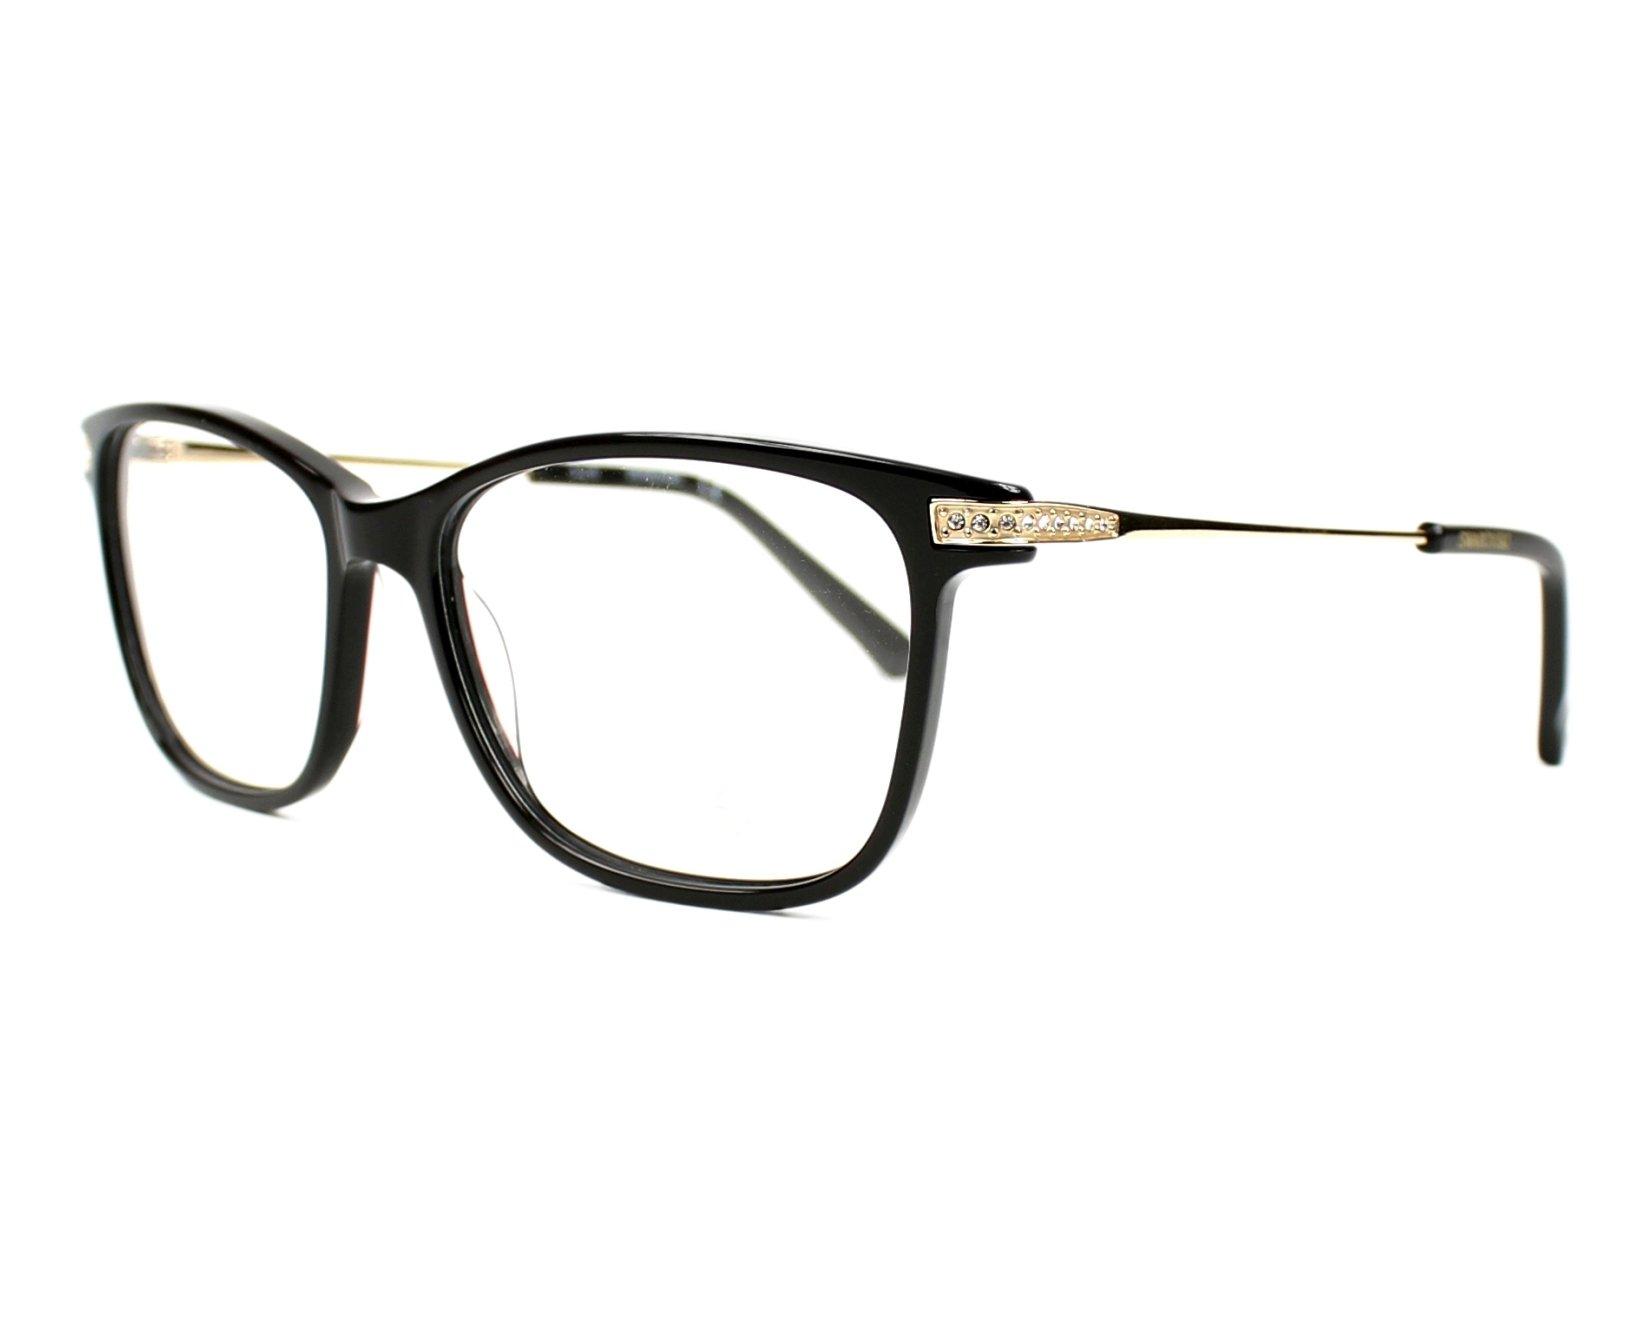 Montures lunettes swarovski